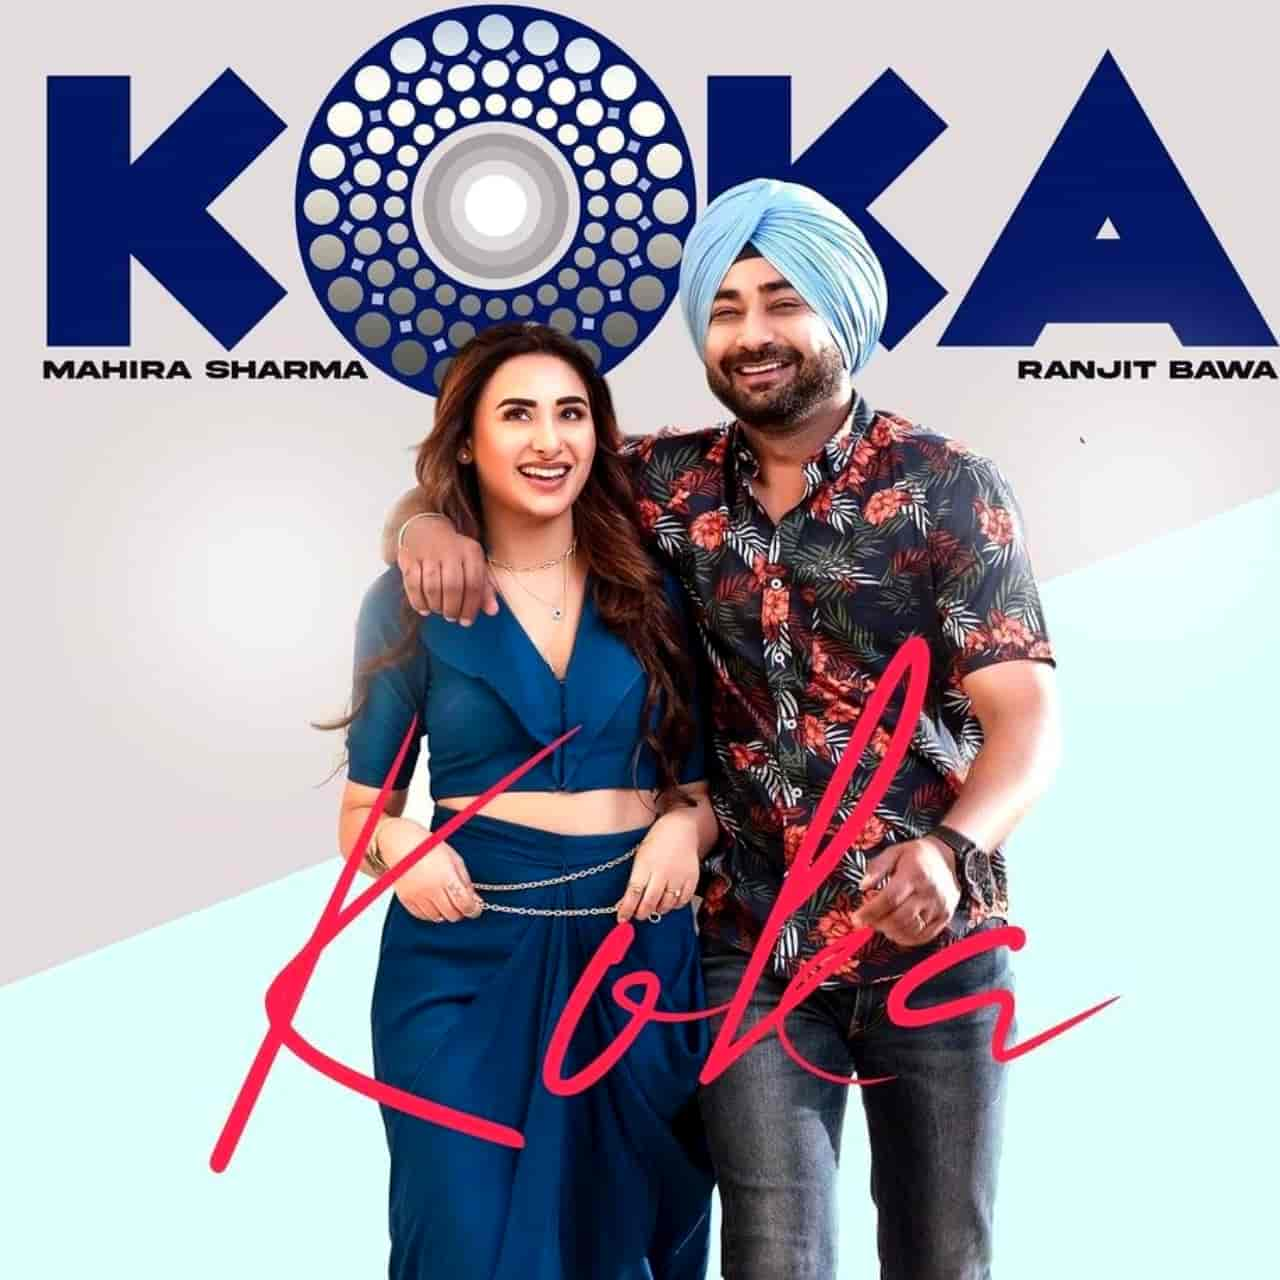 Koka Punjabi Song Lyrics Ranjit Bawa, Mahira Sharma